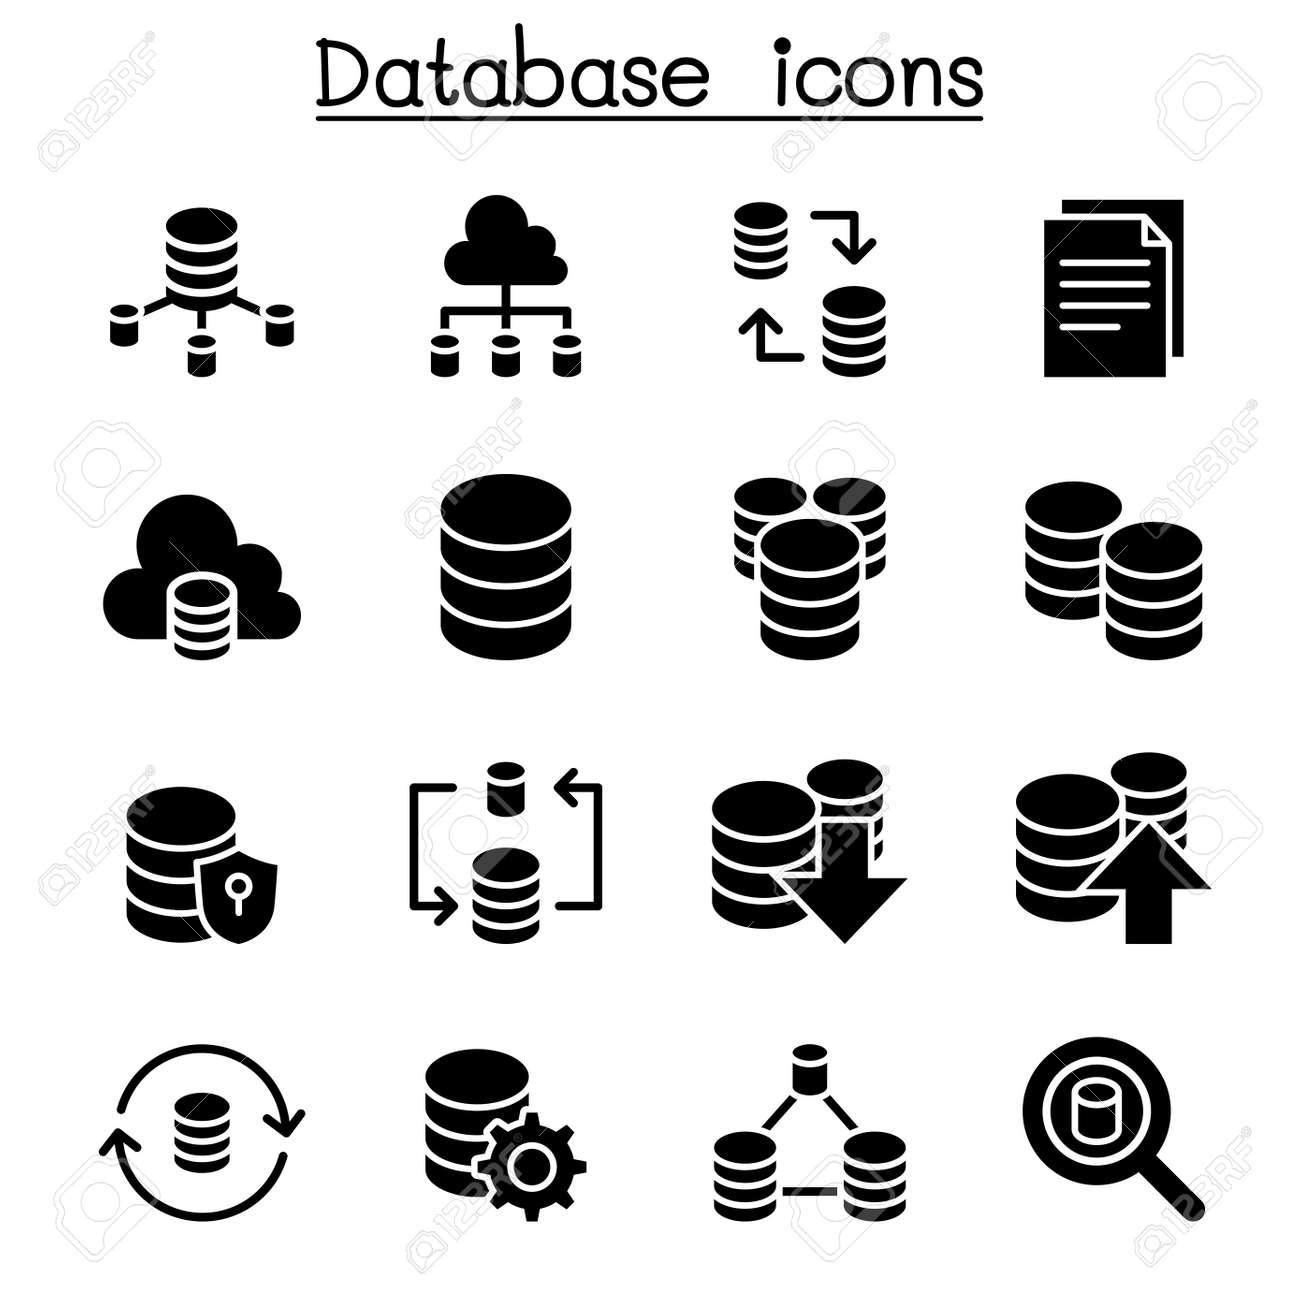 server database hosting sharing cloud computing icon set royalty